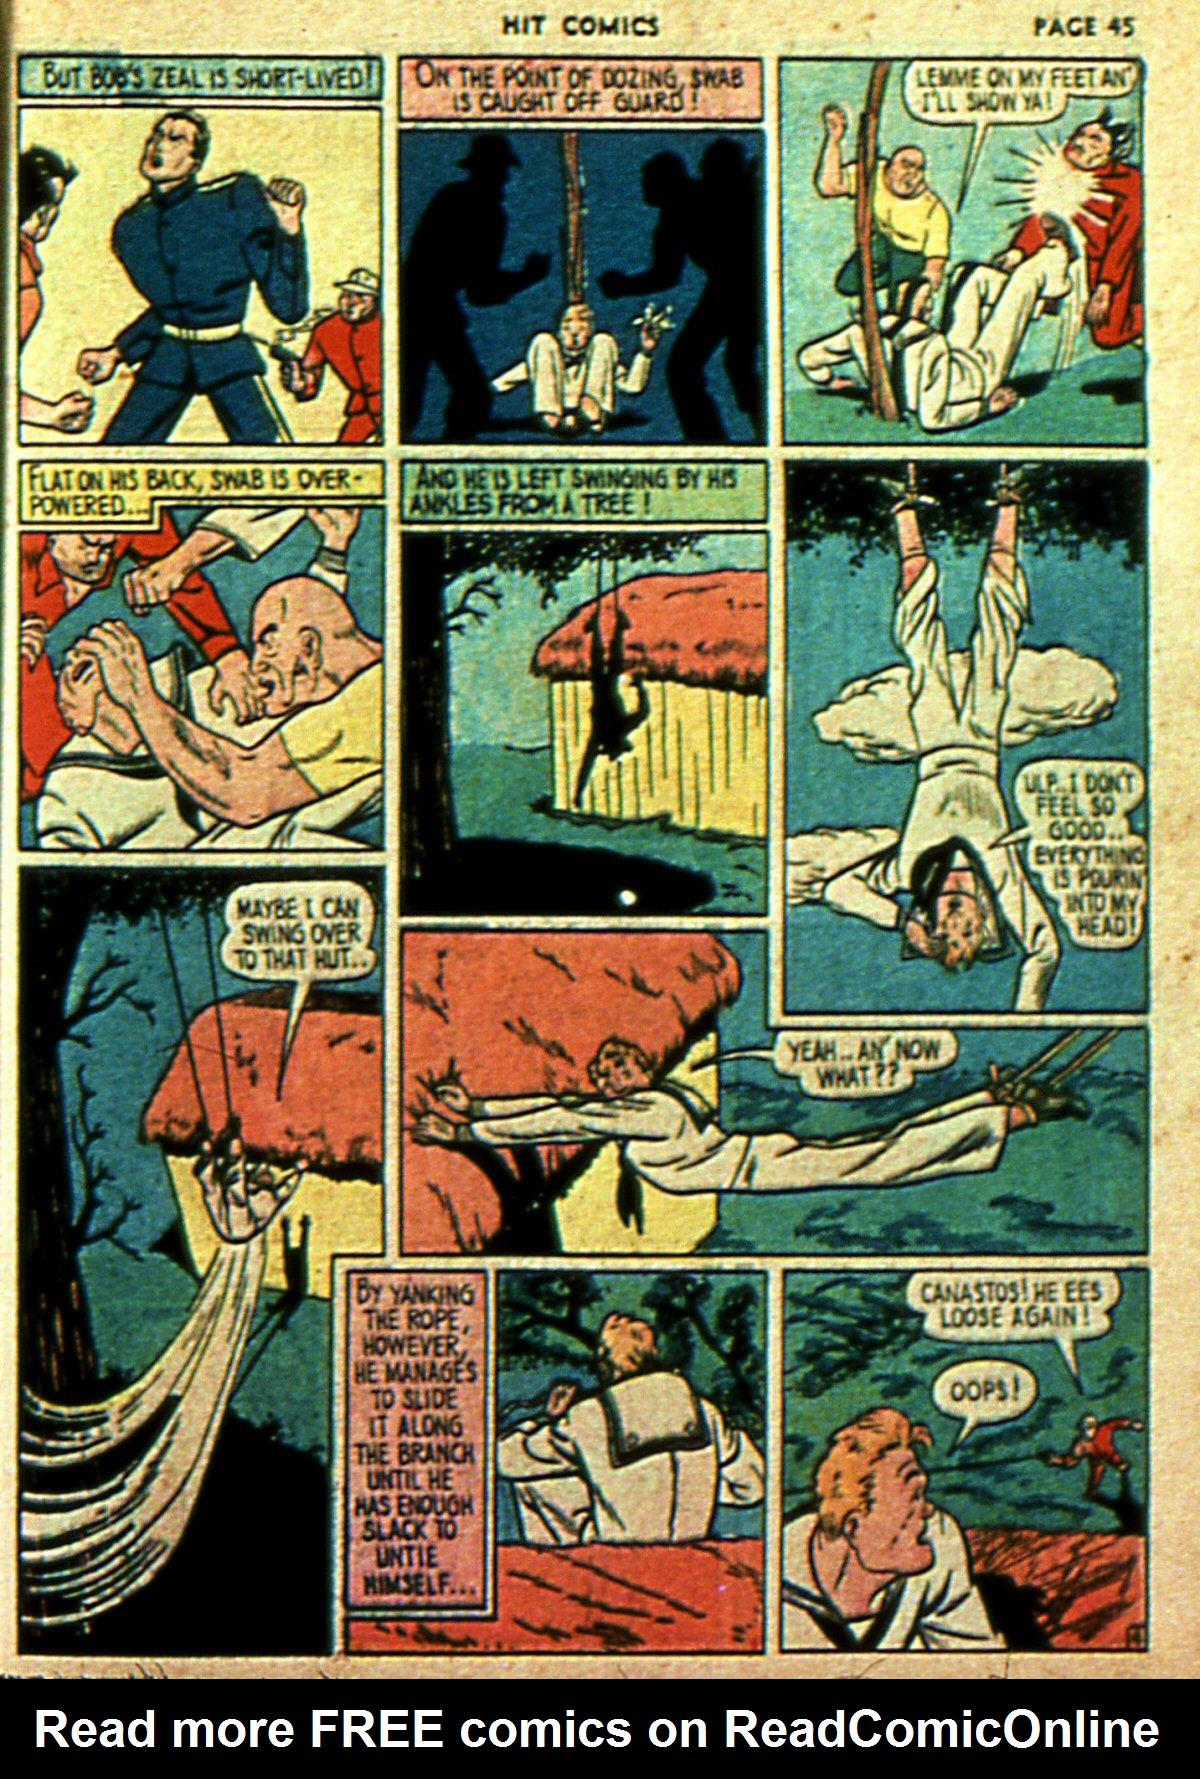 Read online Hit Comics comic -  Issue #2 - 47